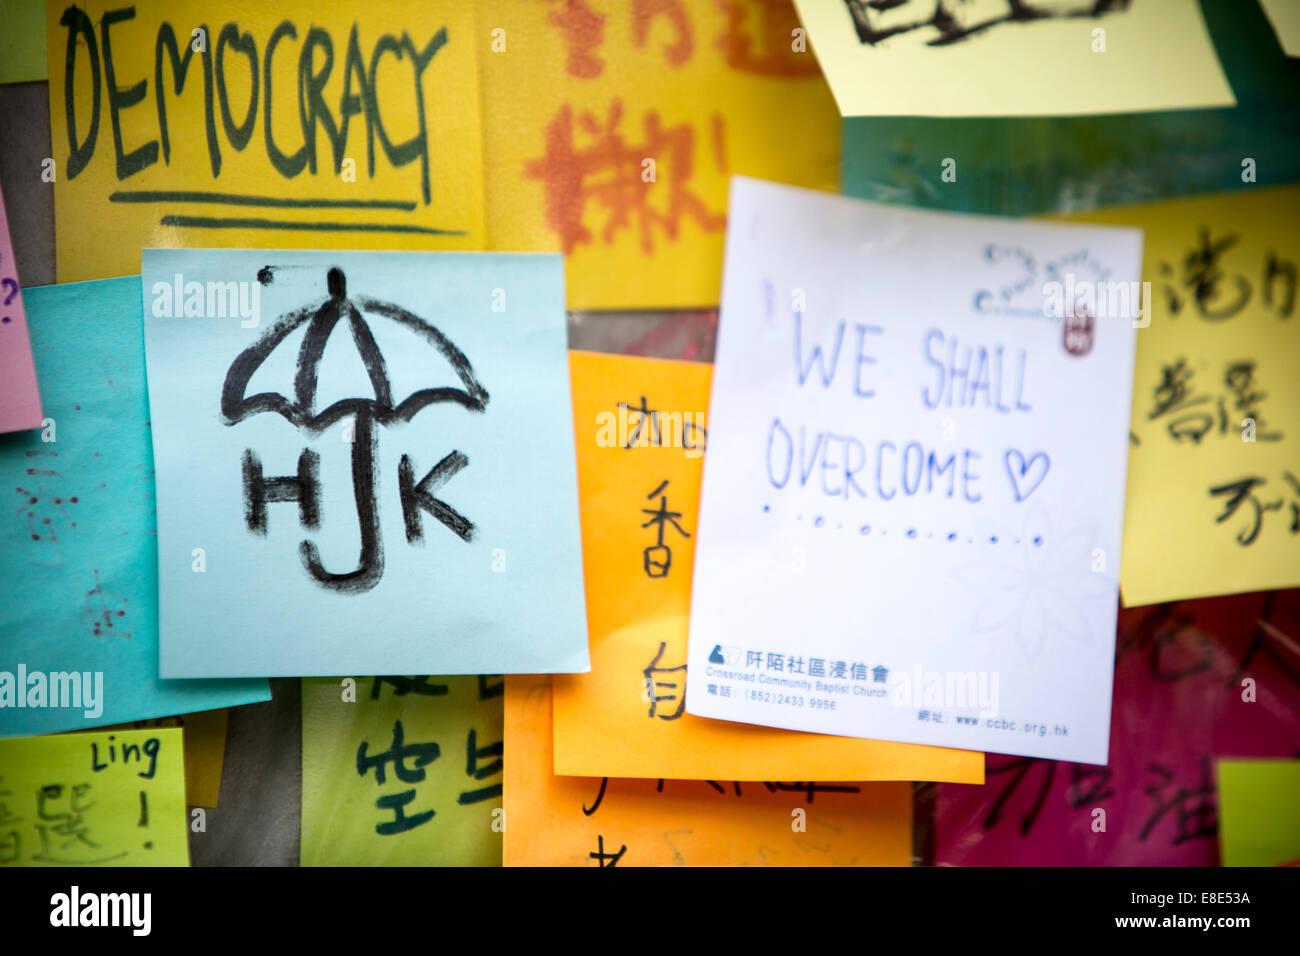 Paraguas revolución en Hong Kong, que luchan por la democracia Imagen De Stock